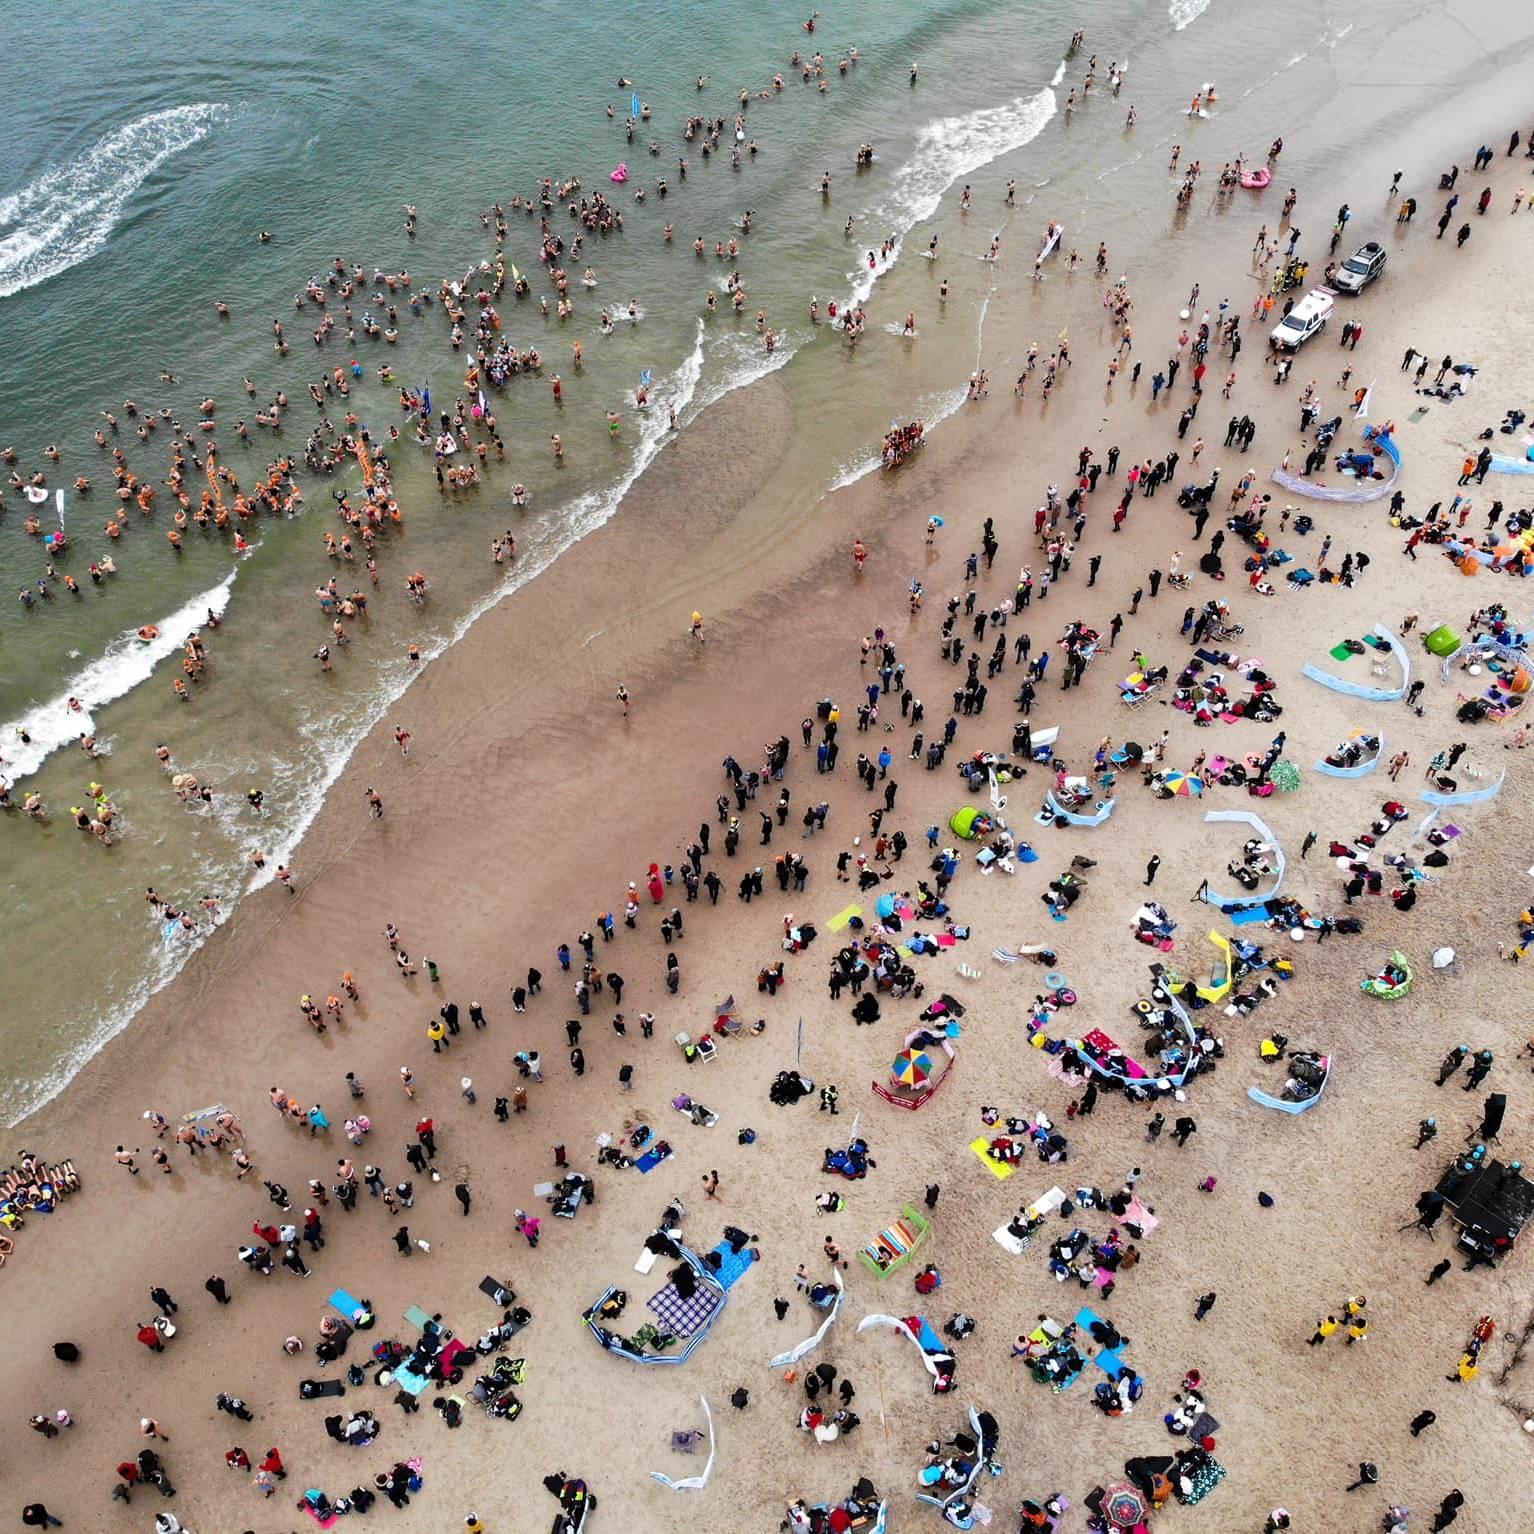 Wielkie Nordowe Morsowanie 2020